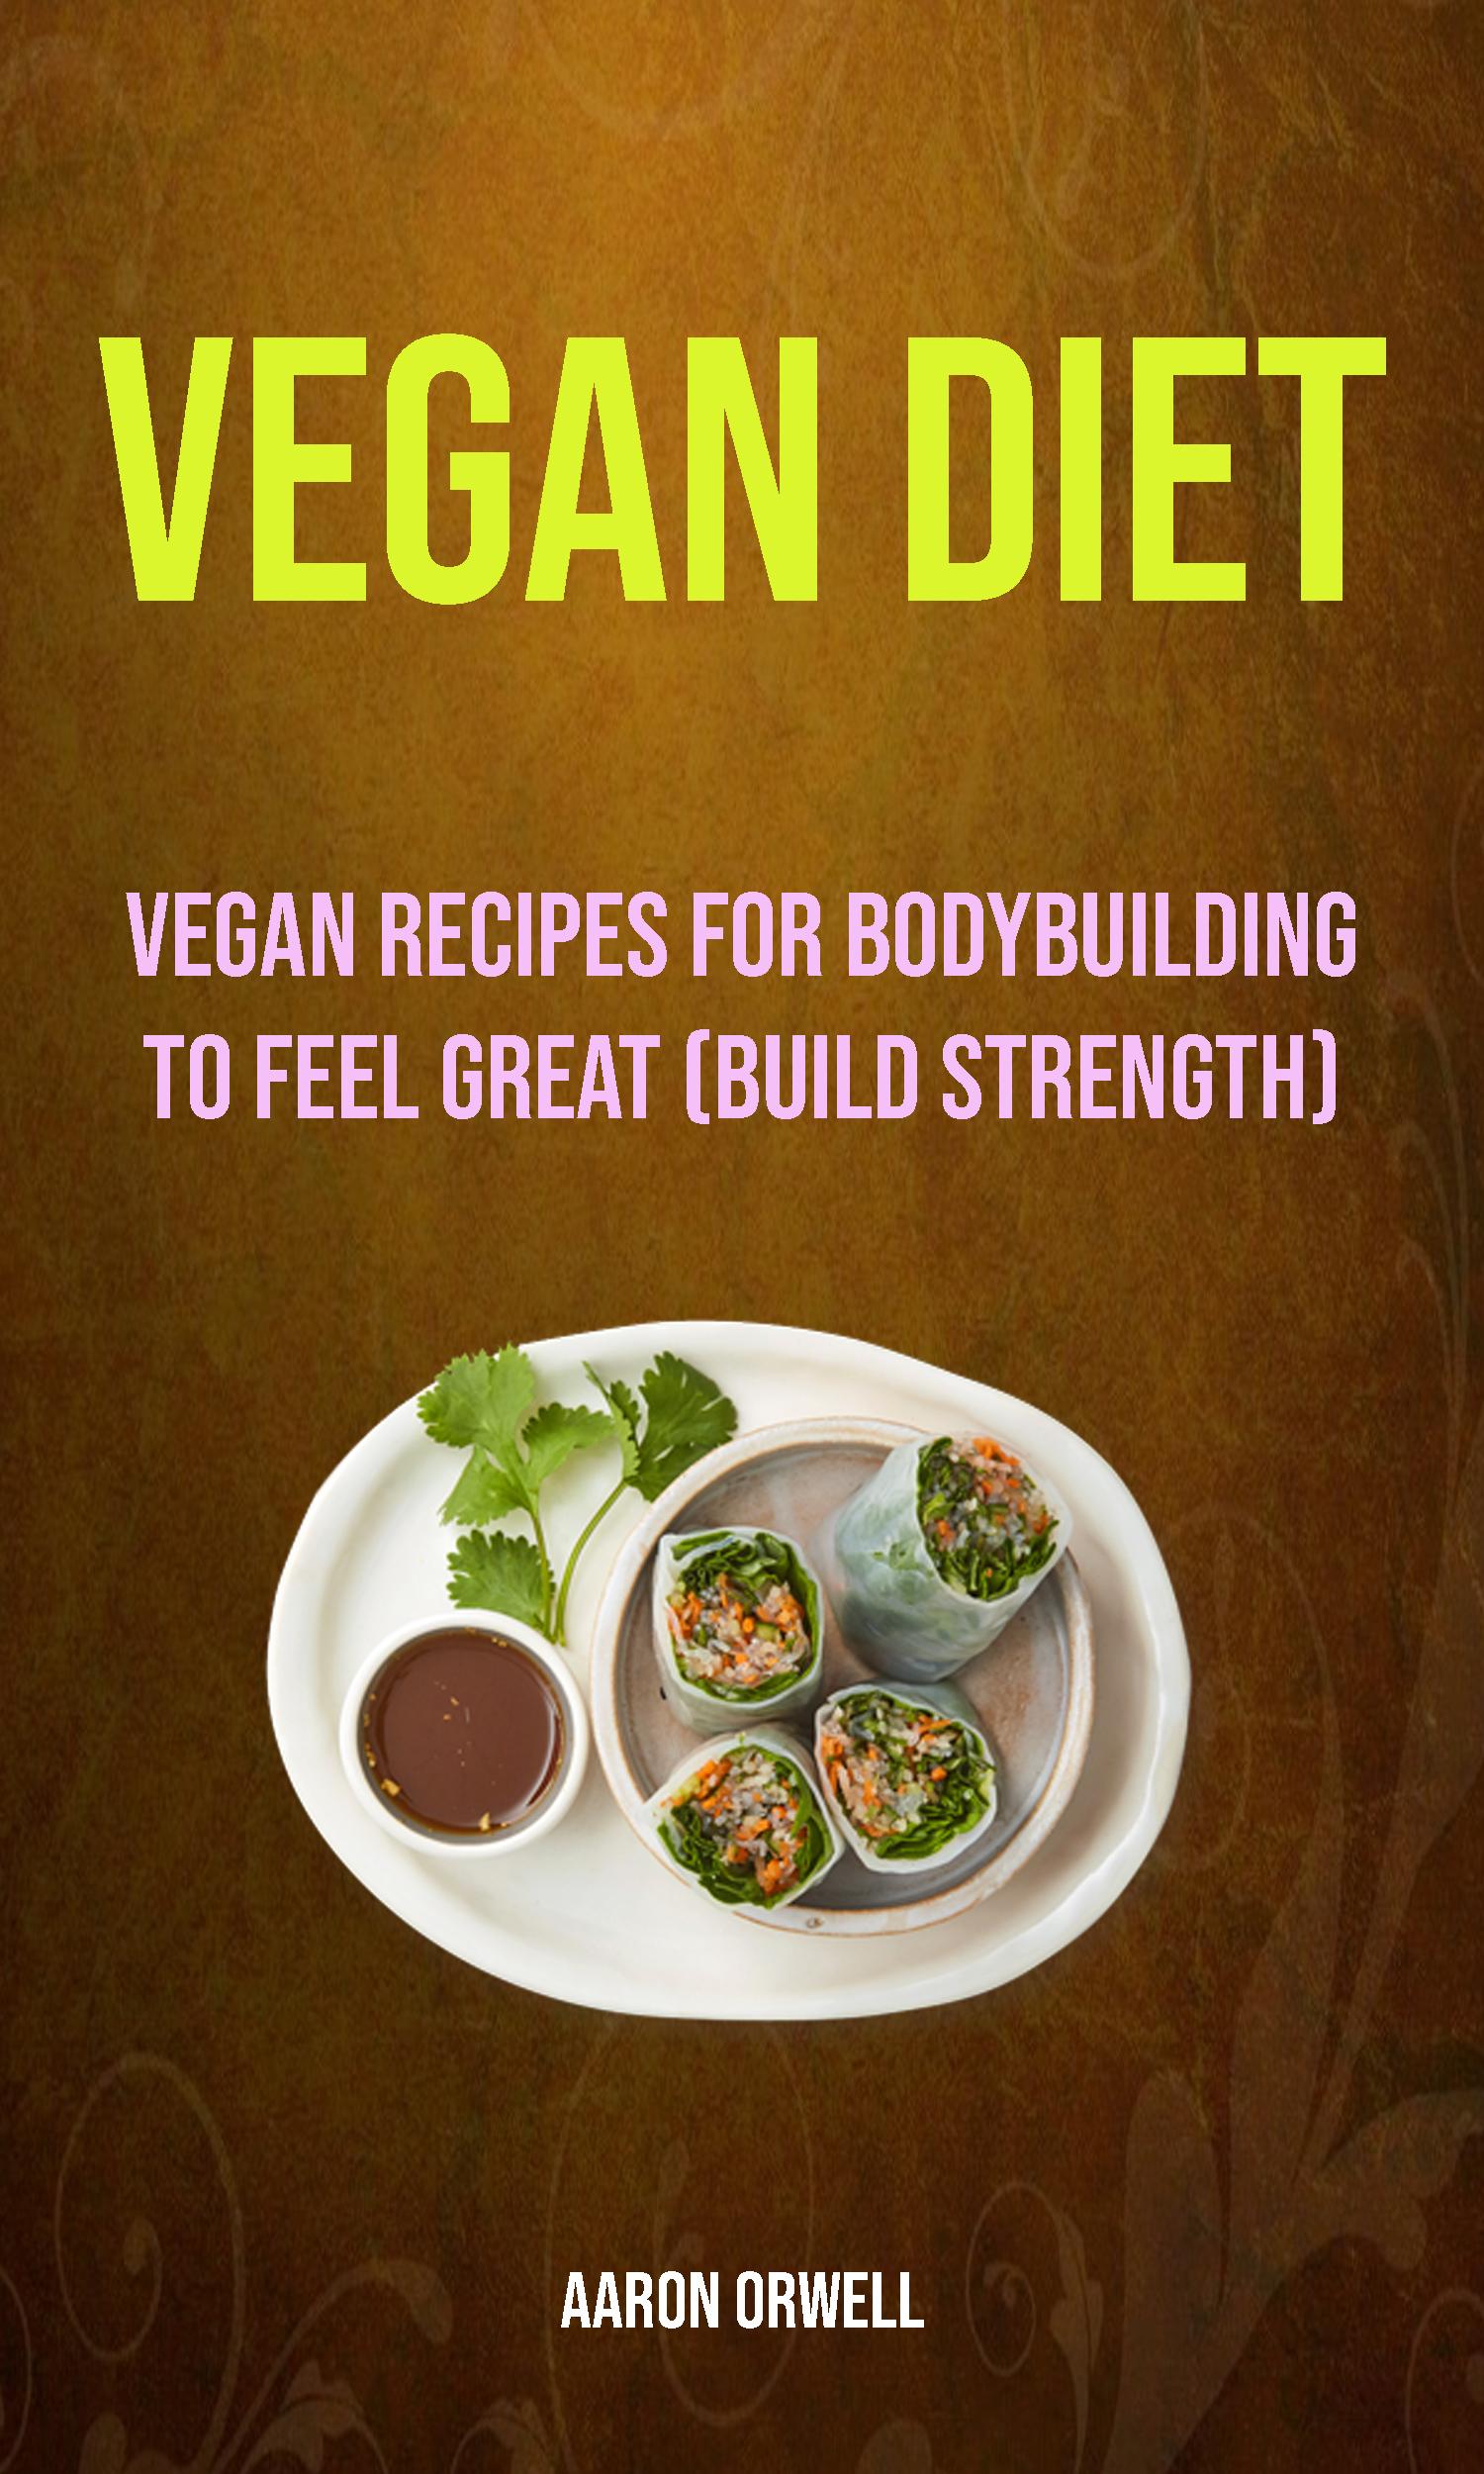 Vegan diet: vegan recipes for bodybuilding to feel great (build strength)